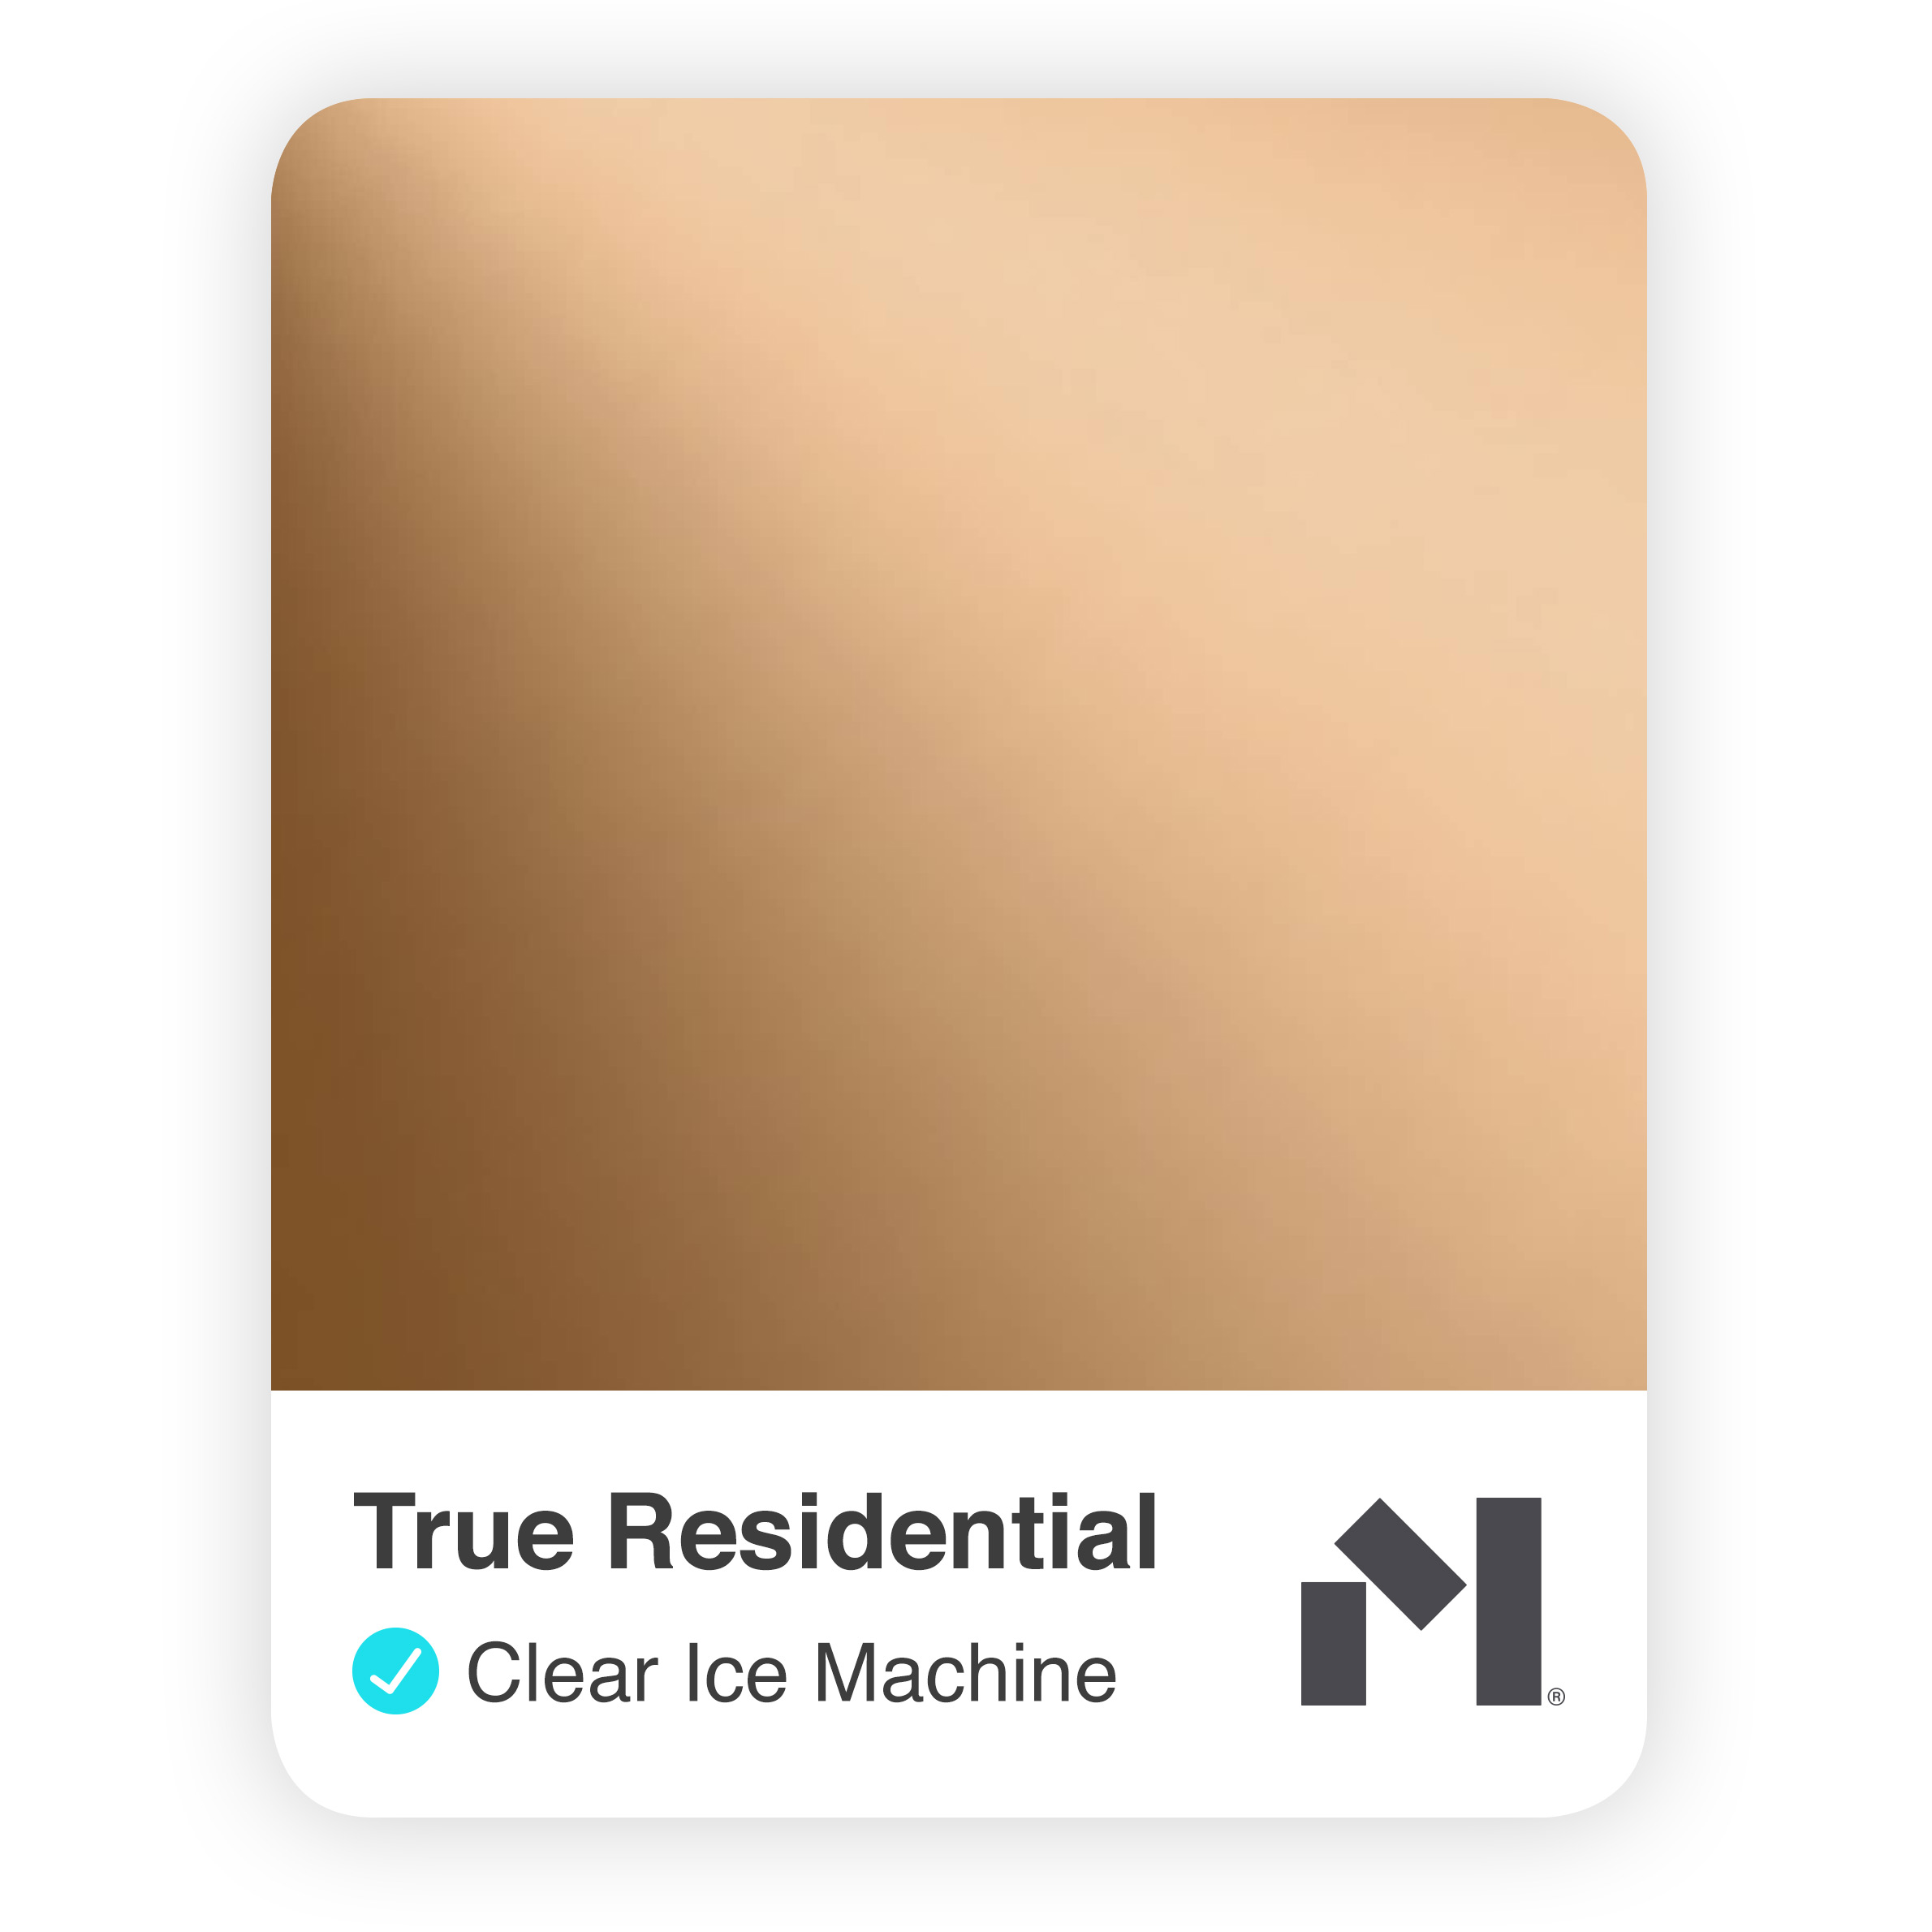 Clear Ice Machine